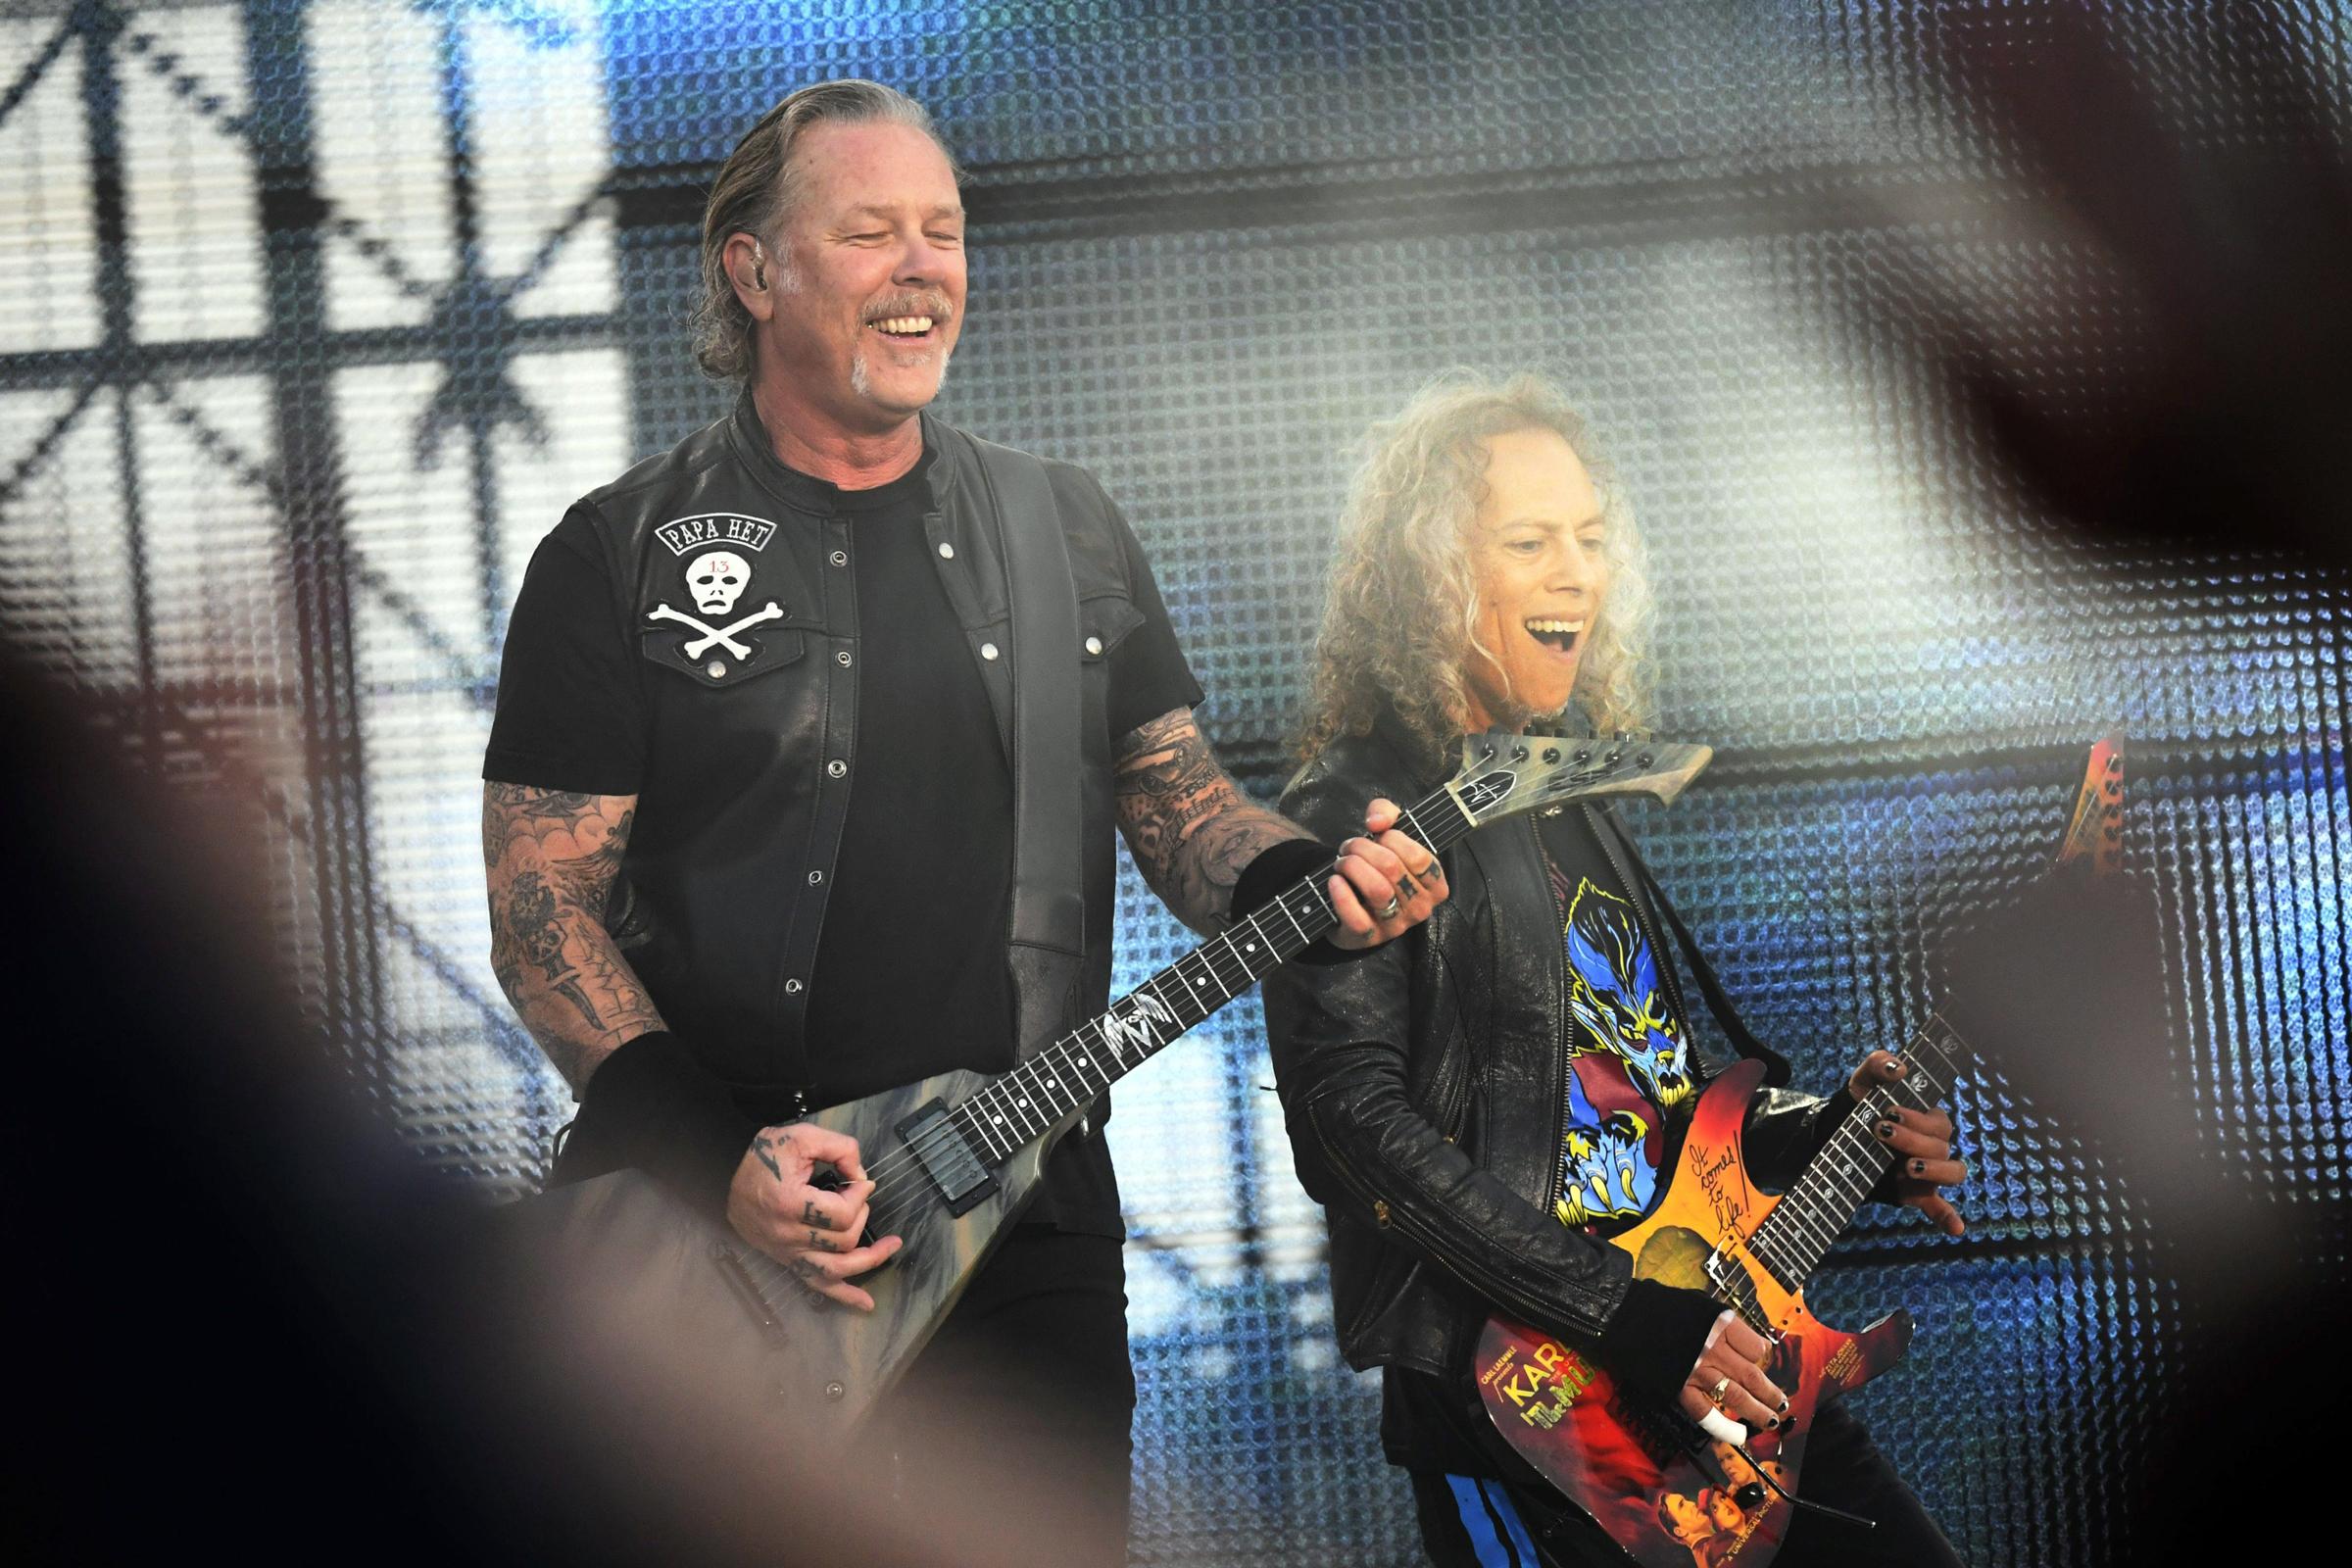 Azalea Festival 2020 Concerts.Metallica Announce Headlining Gigs At Five 2020 U S Music